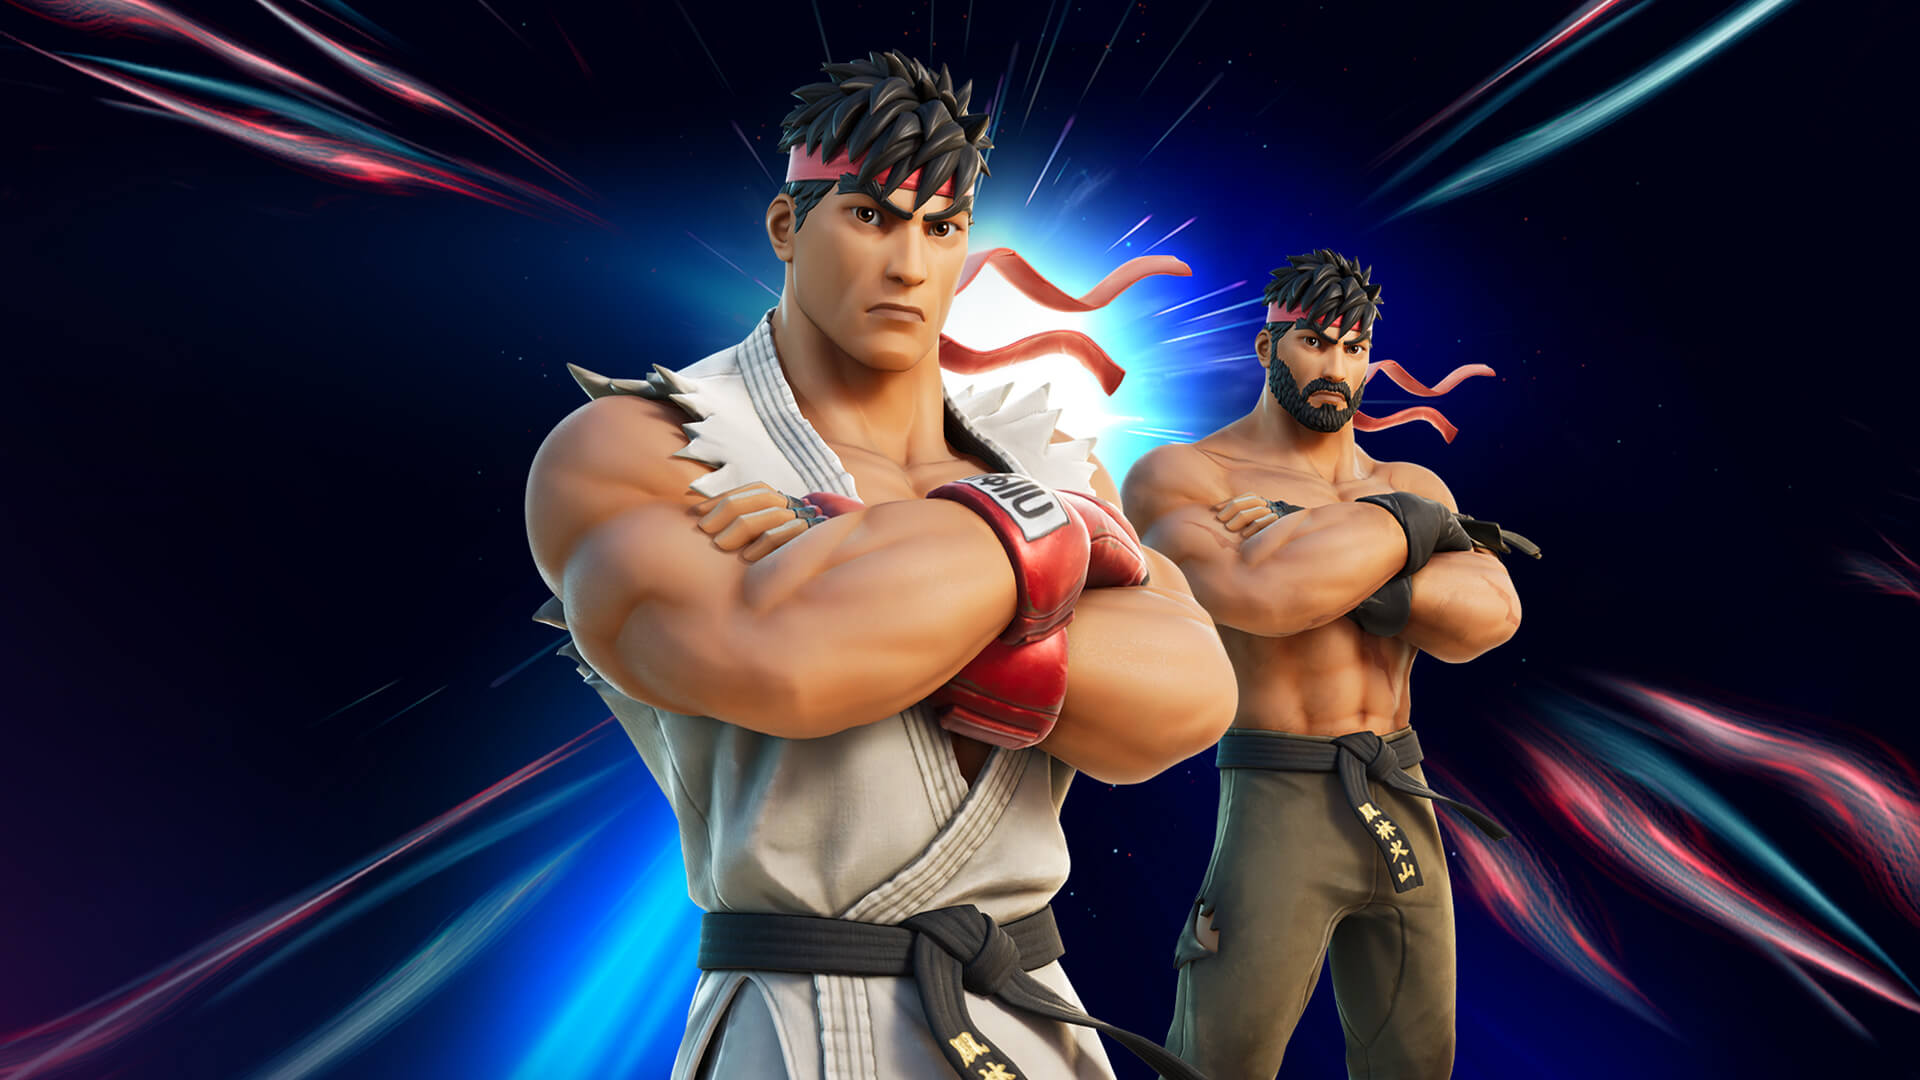 Fortnite obohatily postavy ze Street Fightera Ryu